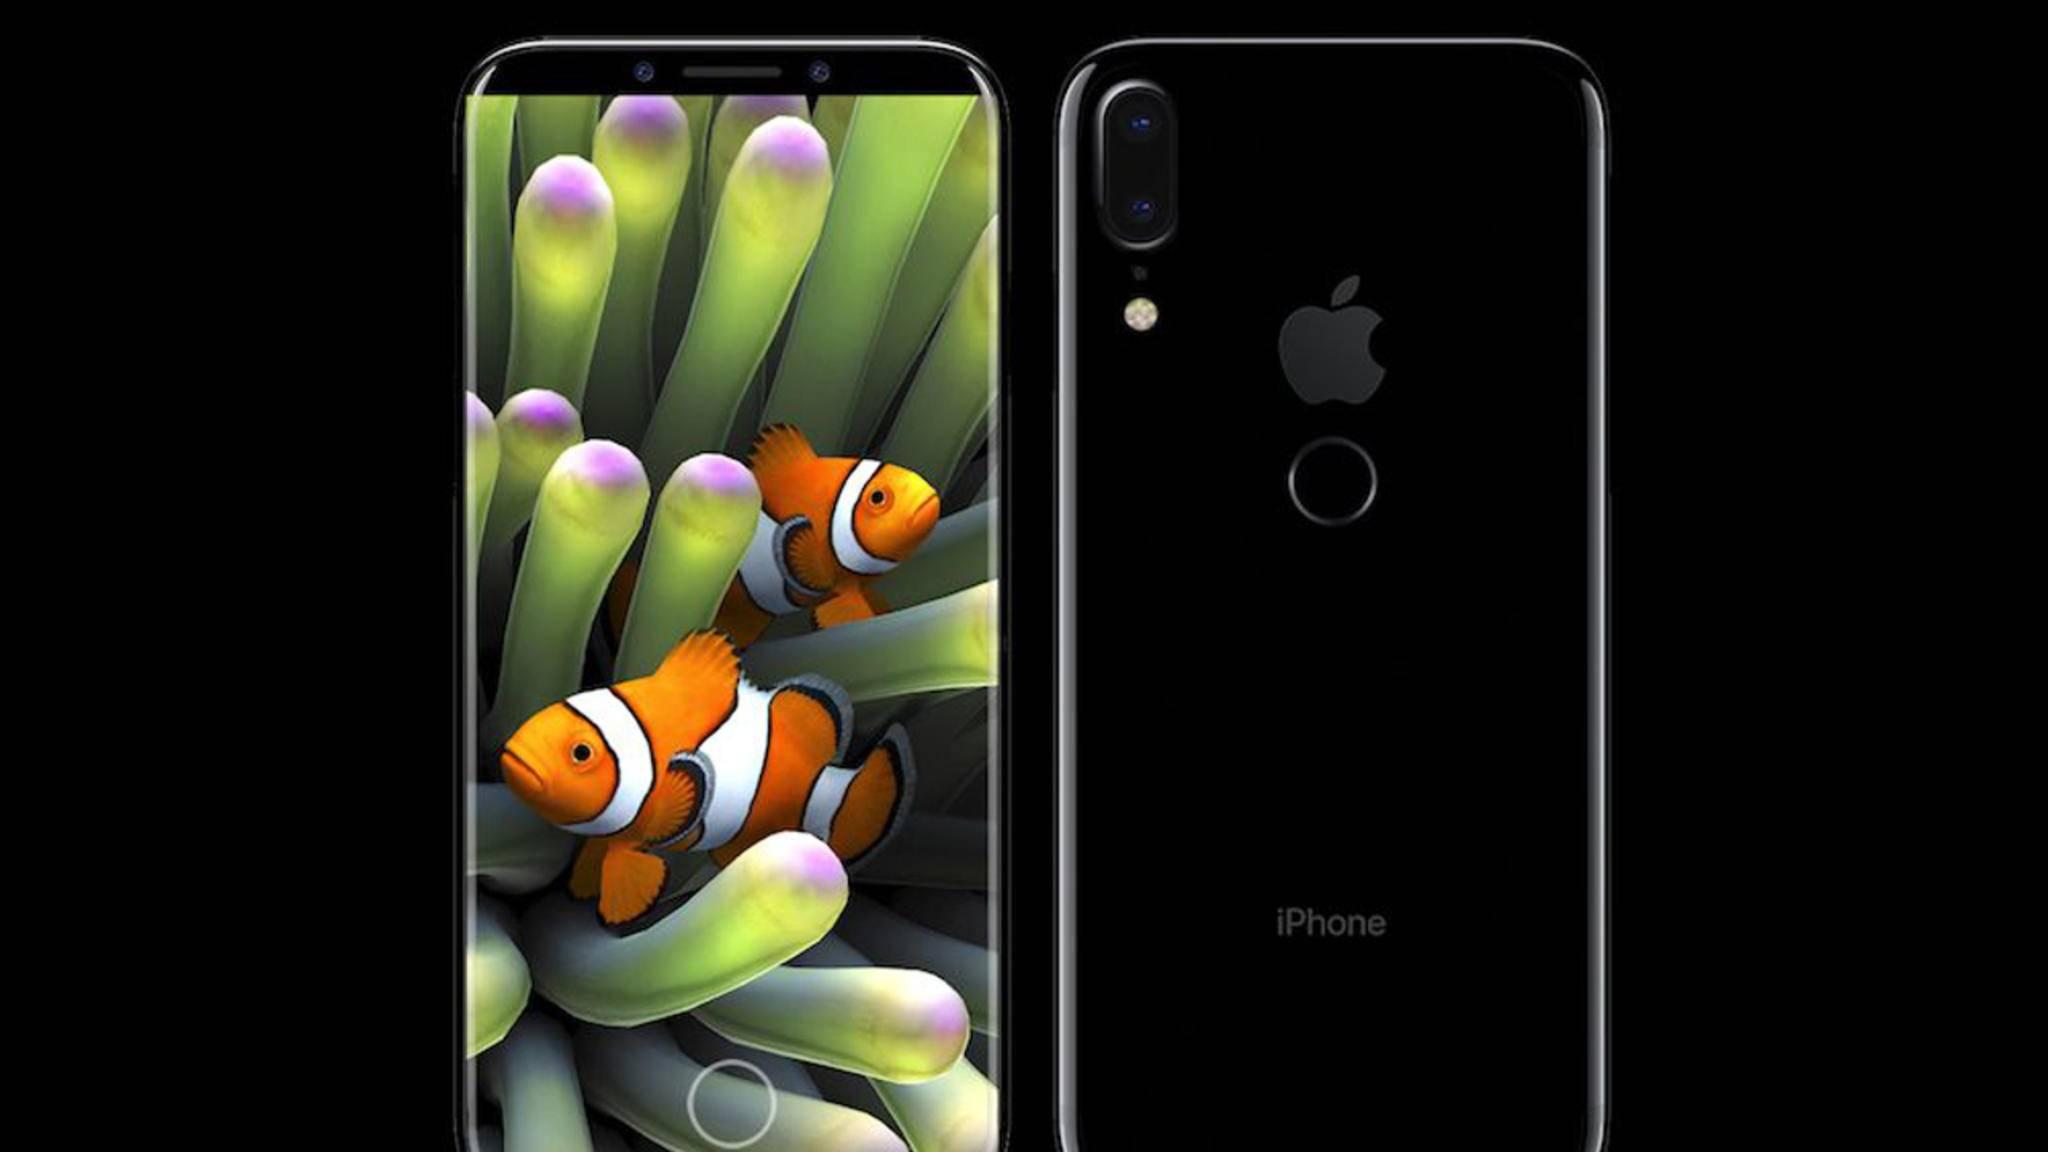 Den Fingerabdrucksensor unter dem Display unterzubringen bleibt angeblich Apples größtes iPhone 8-Problem.